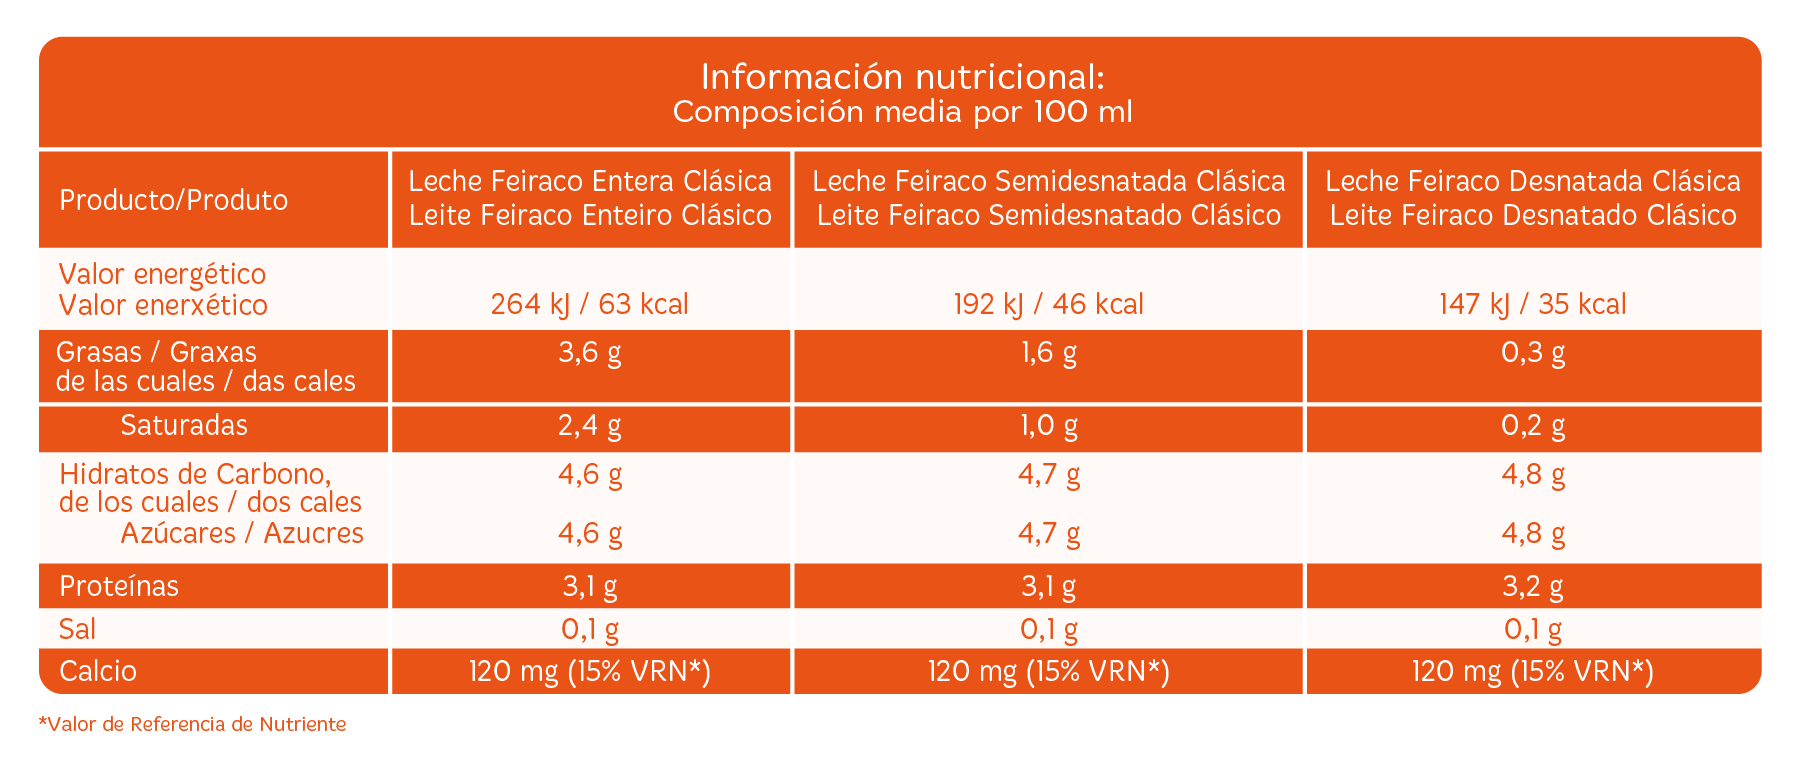 Ficha nutricional Leche clásica Feiraco